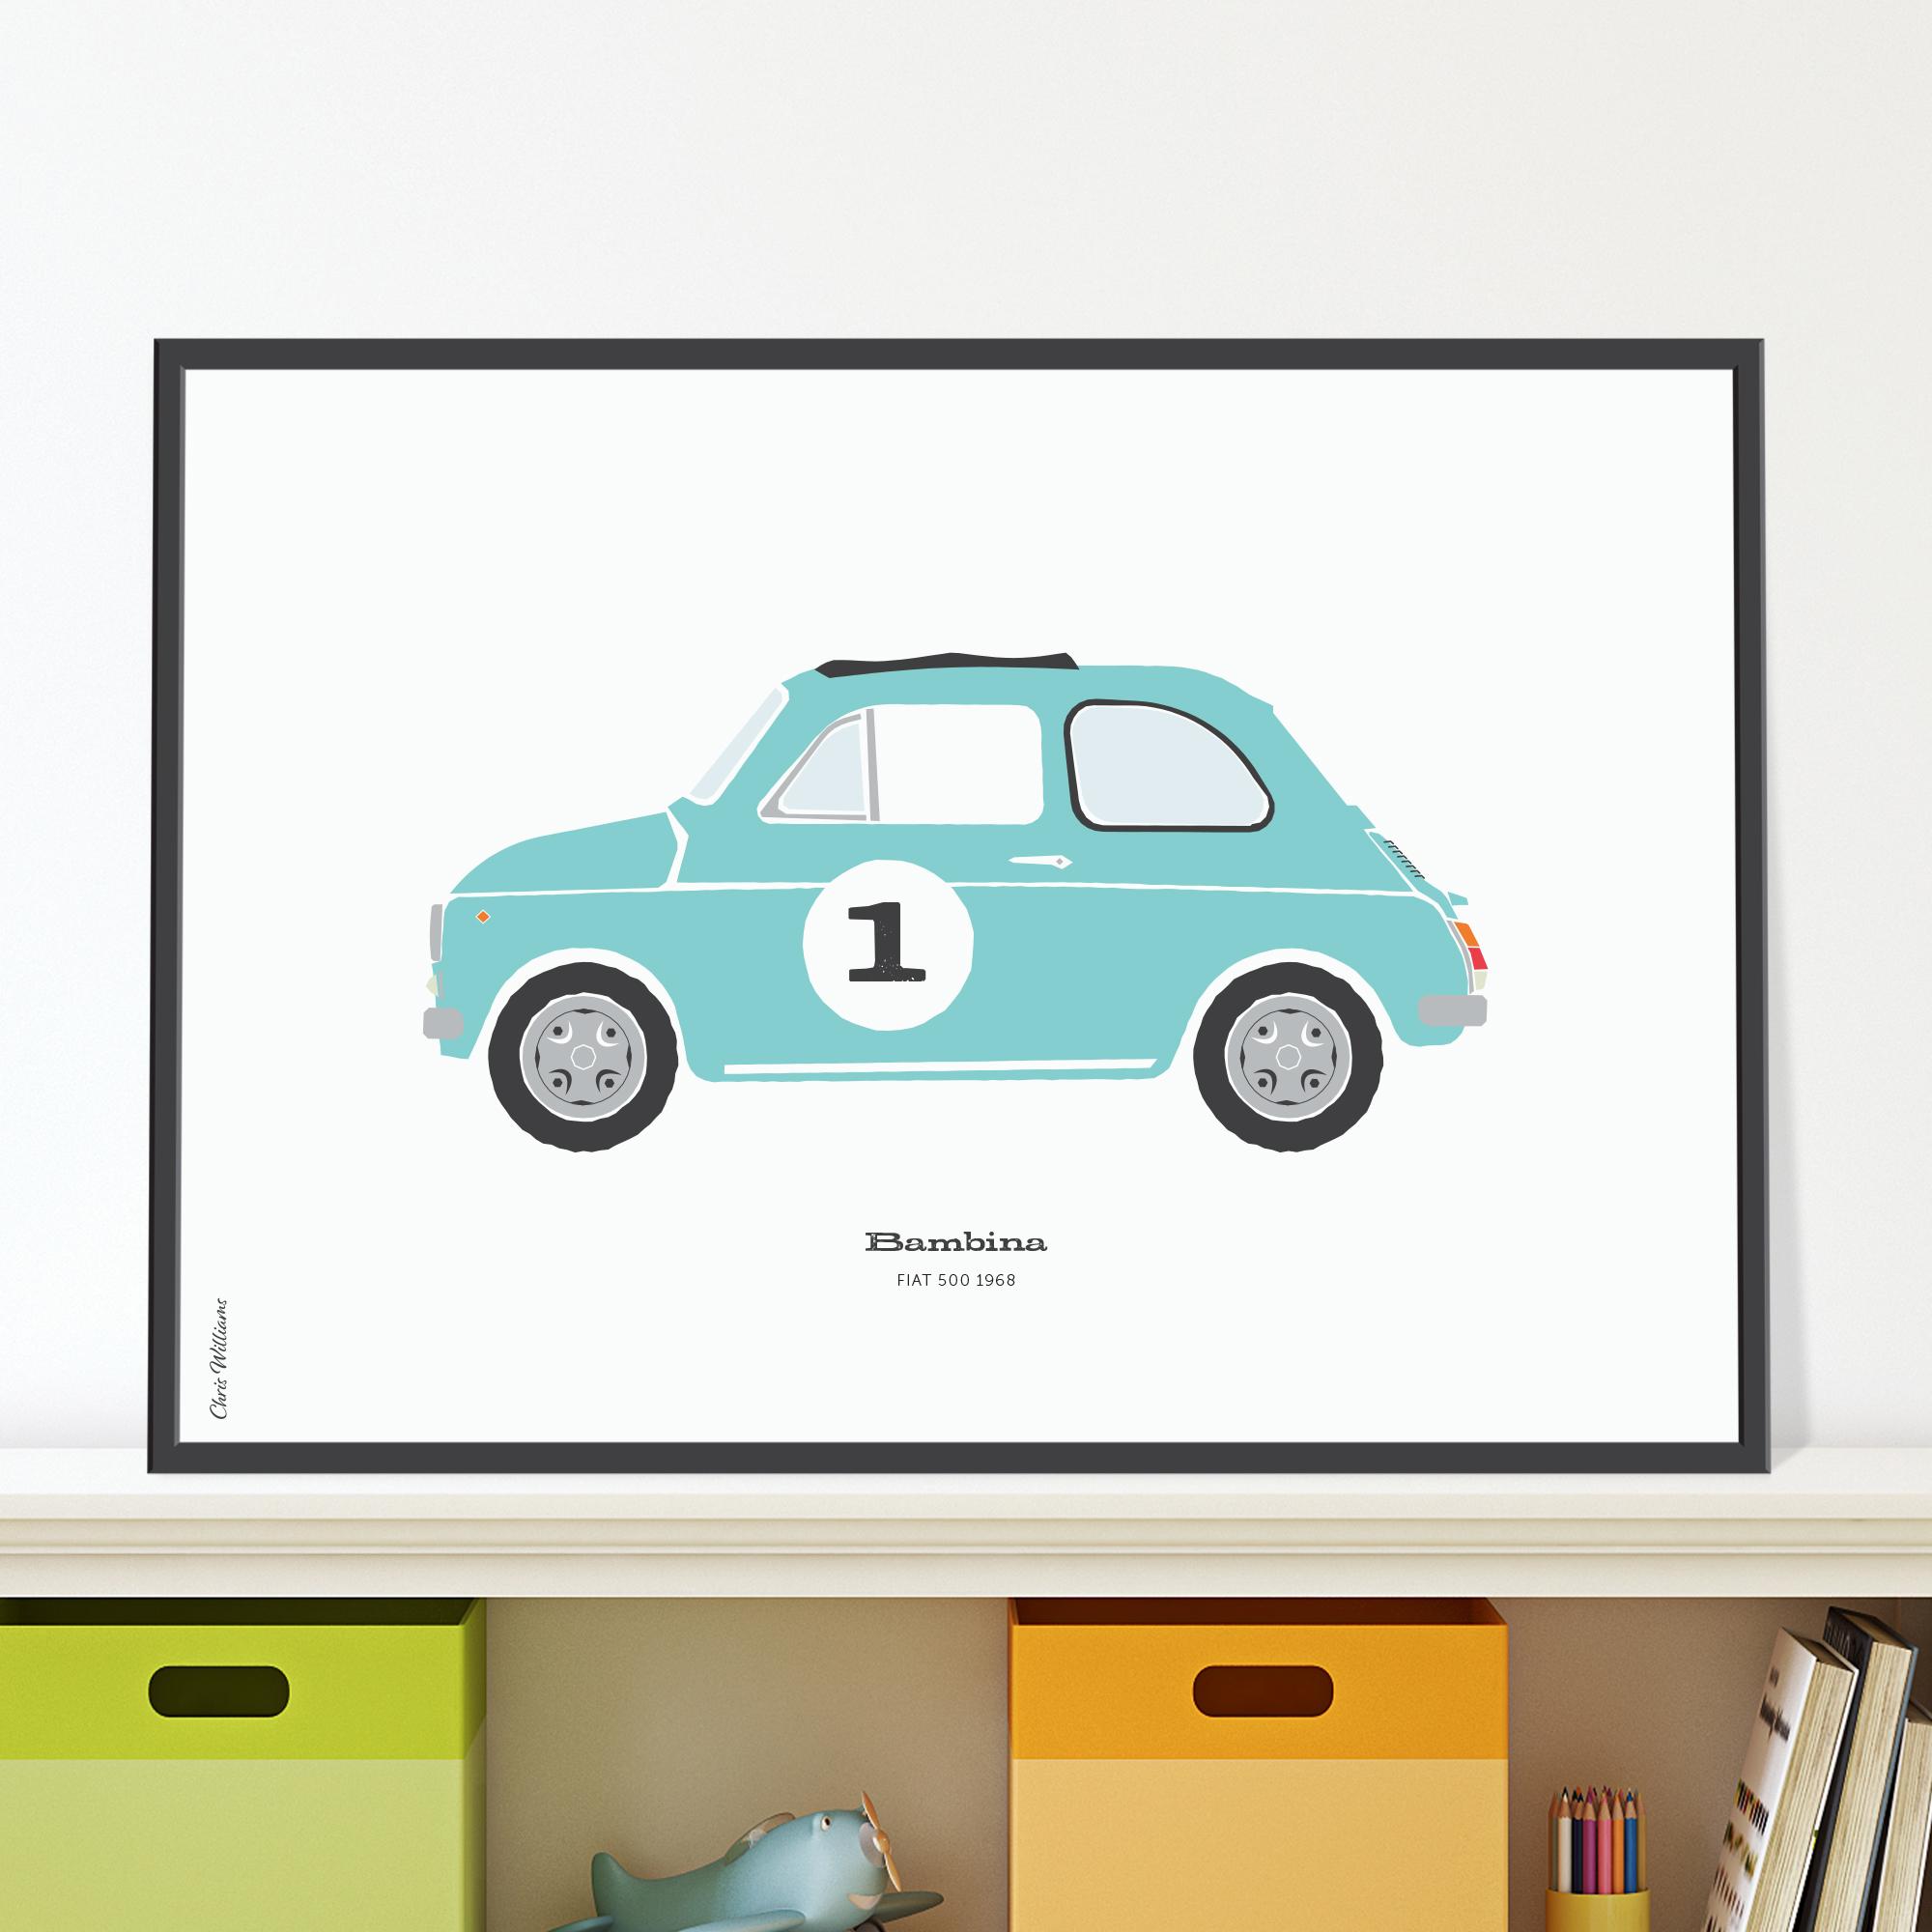 Fiat-500-toybox-zoom